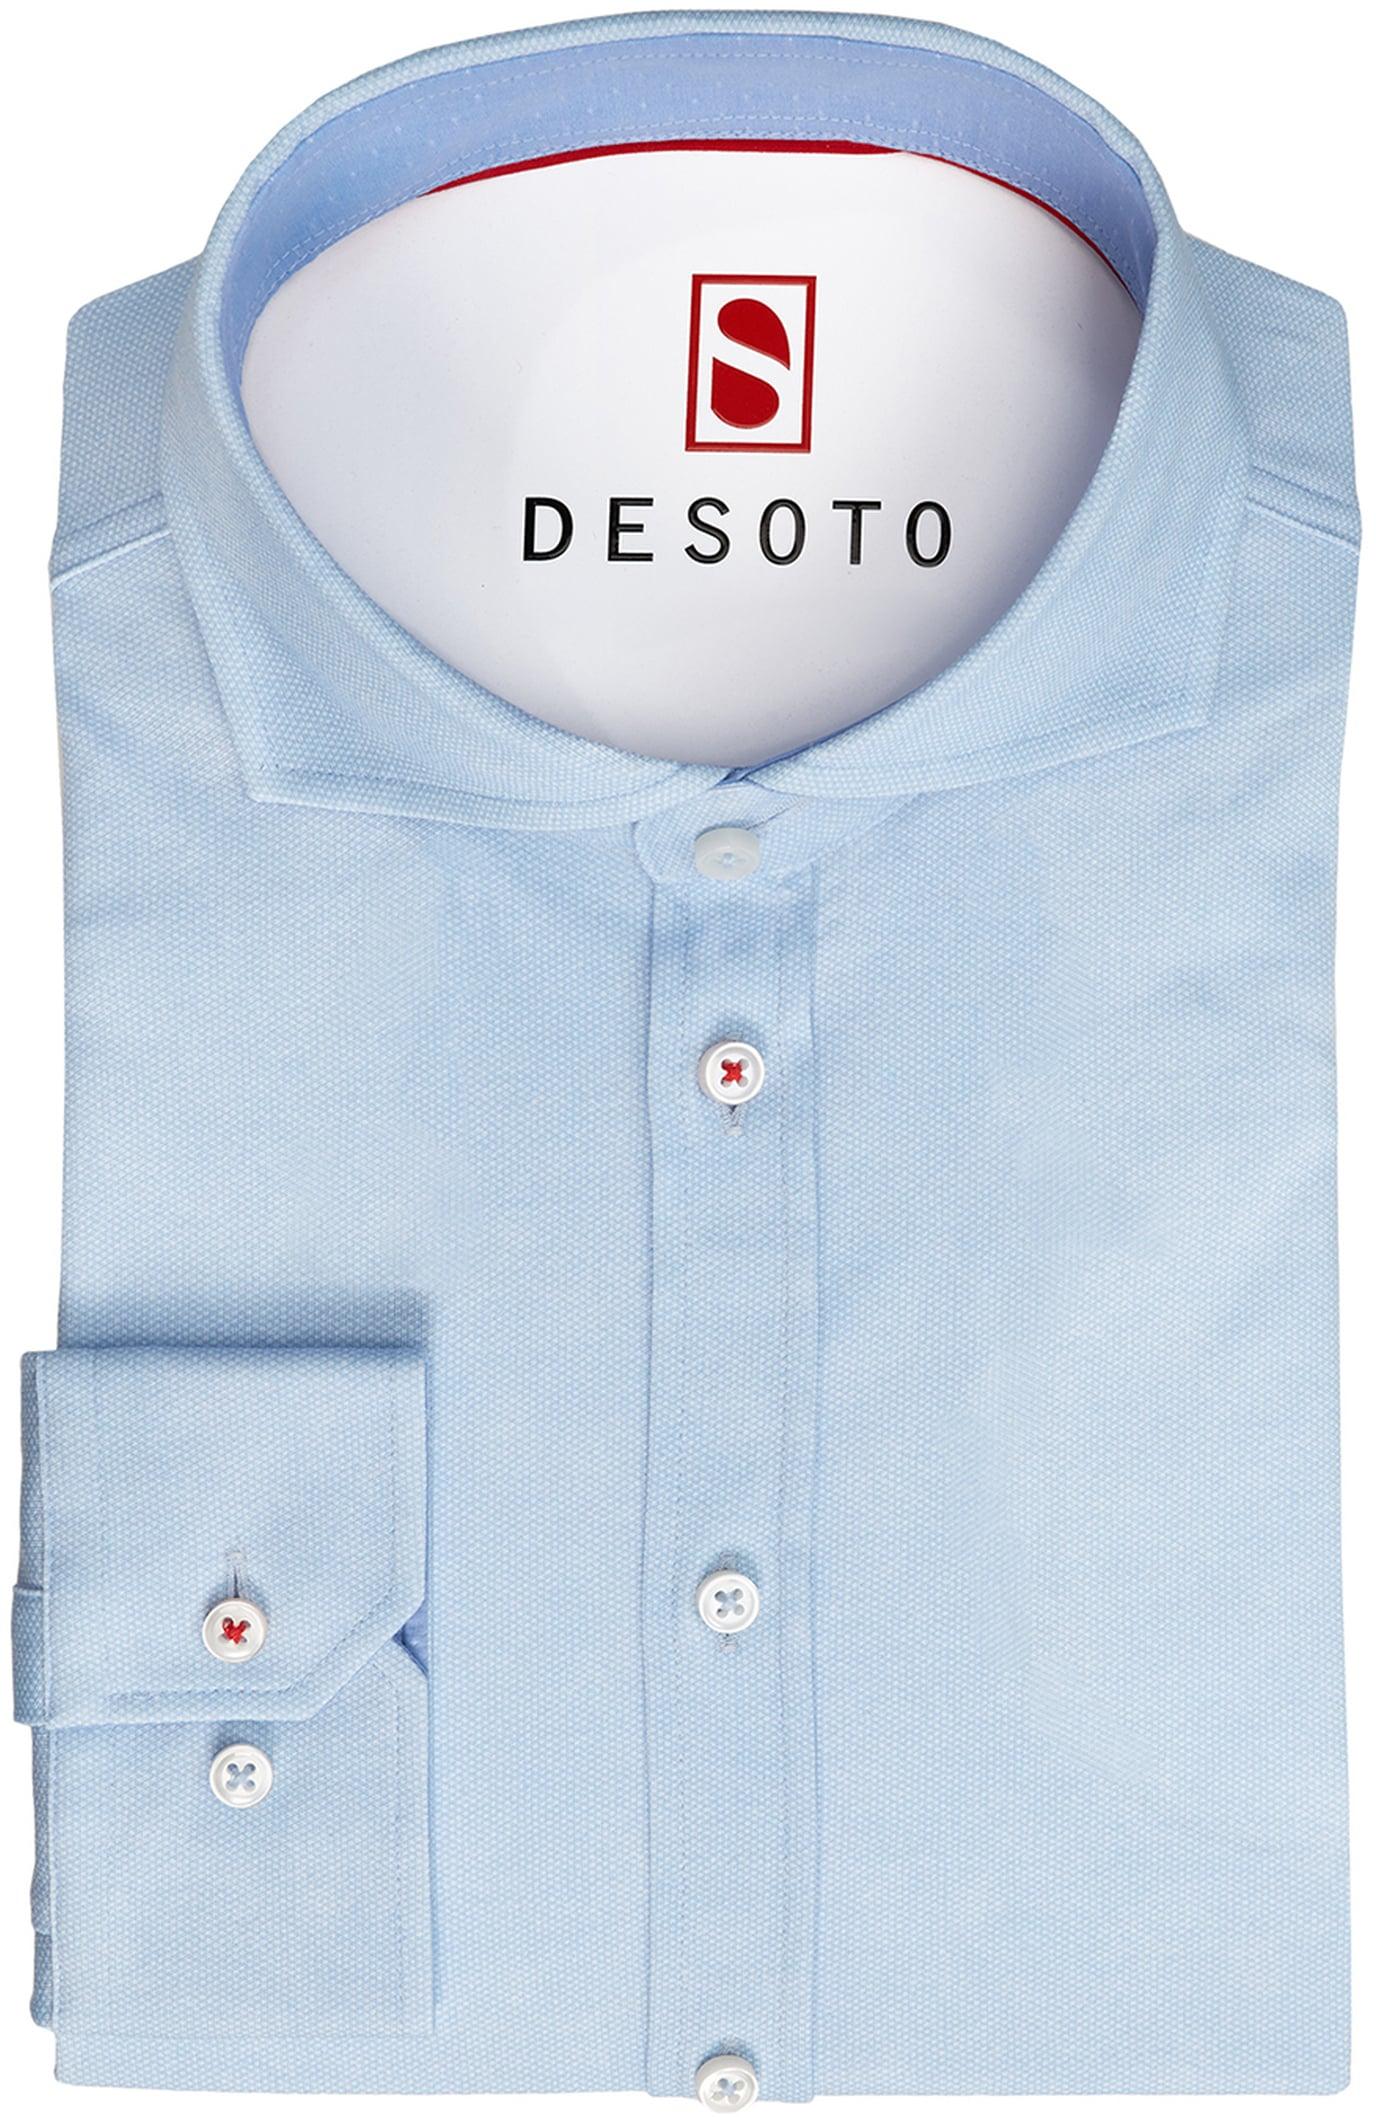 Desoto Overhemd Strijkvrij Blauw Oxford